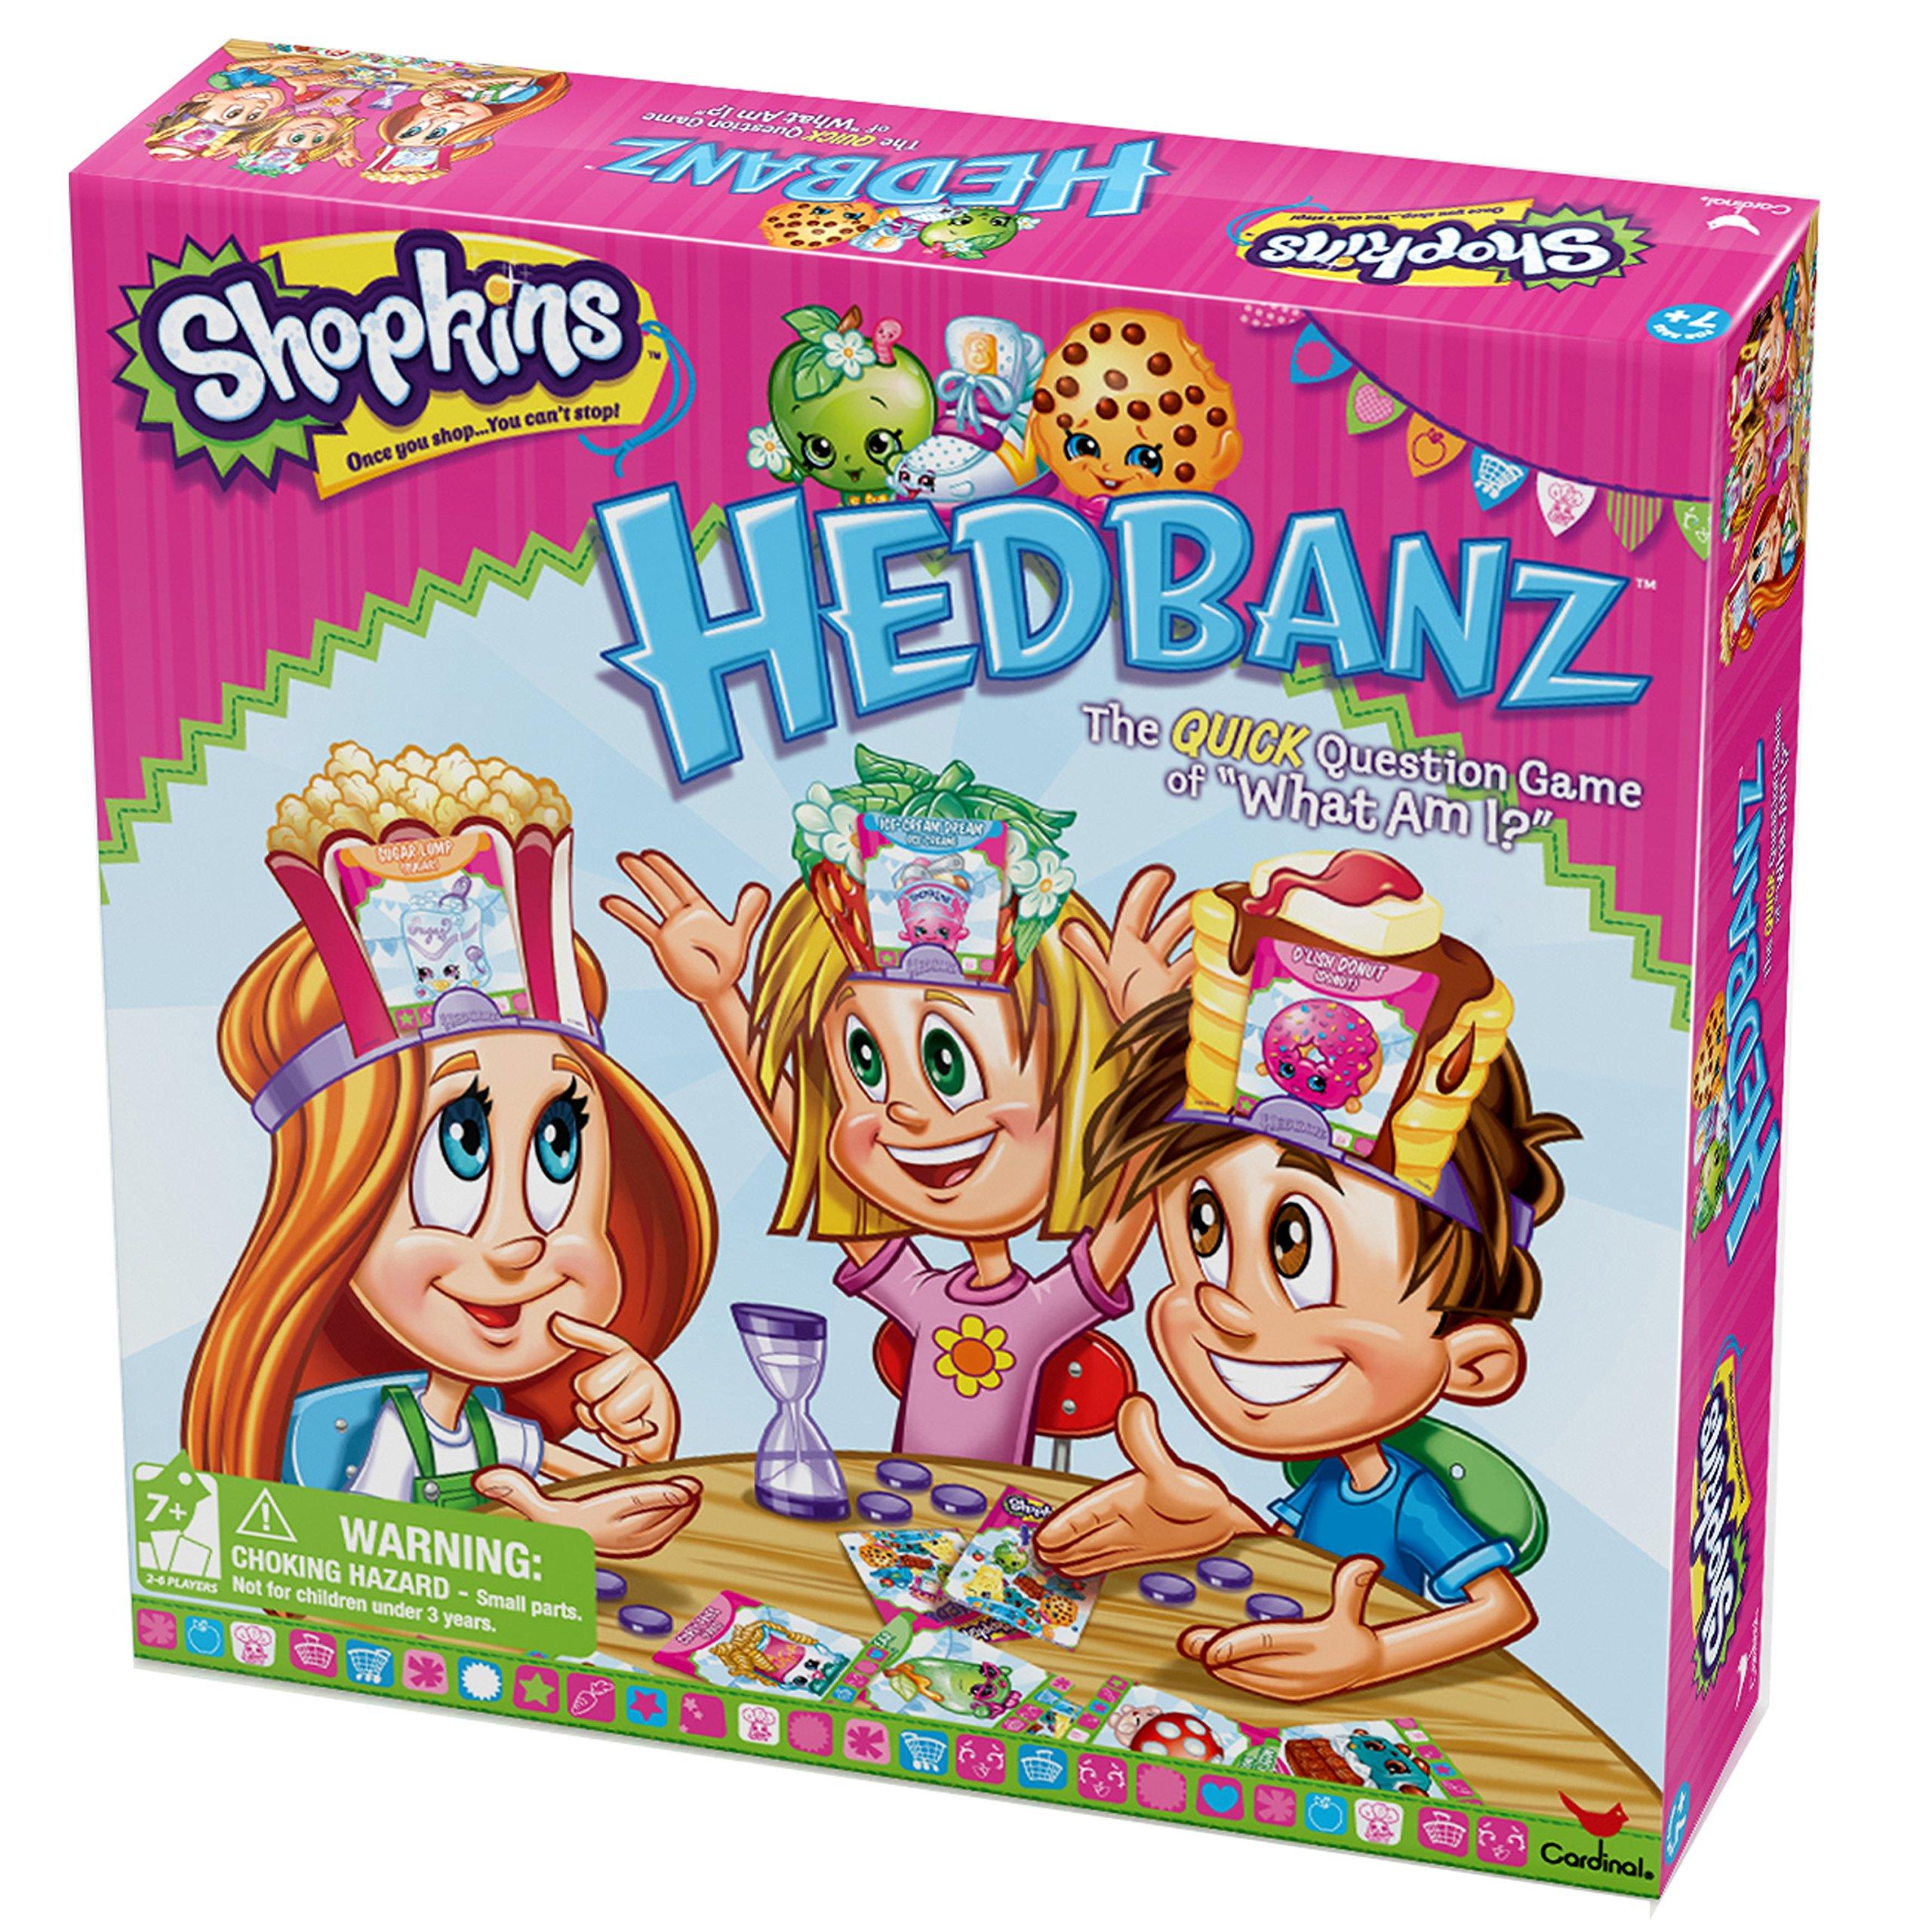 Board Games Toy : Shopkins hedbanz board game fun kids girls toy new